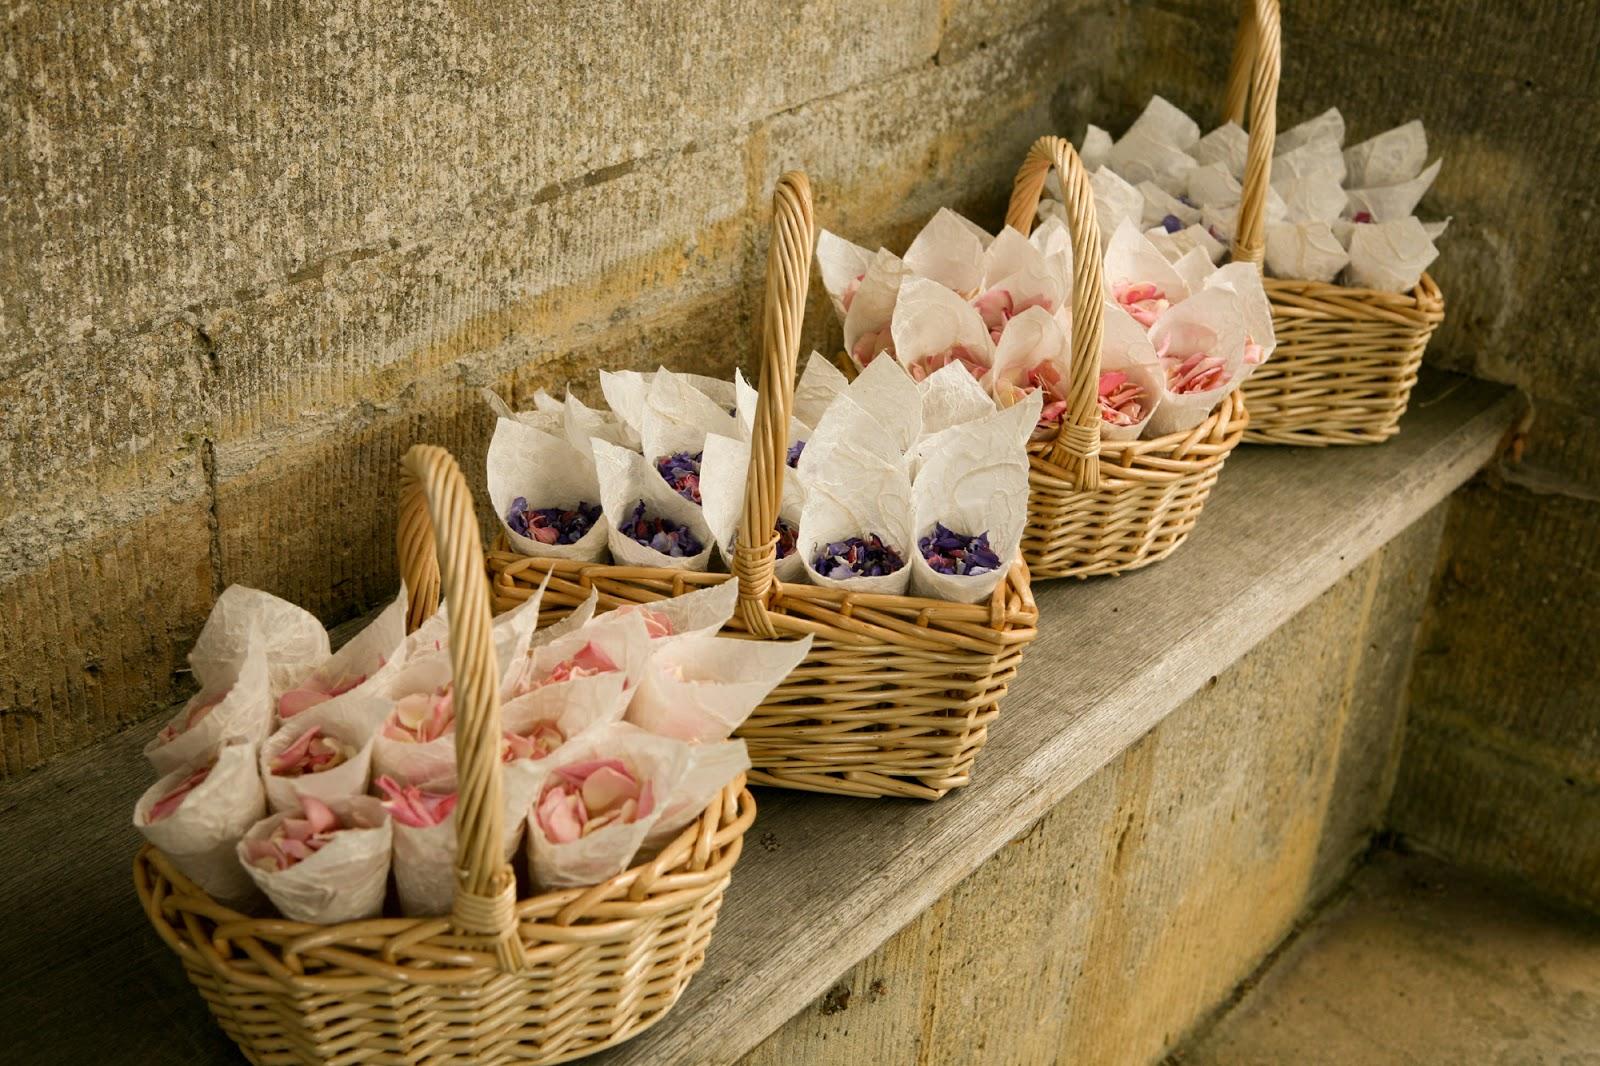 5 wedding send off ideas for wedding send off ideas Image via Manor House Bride